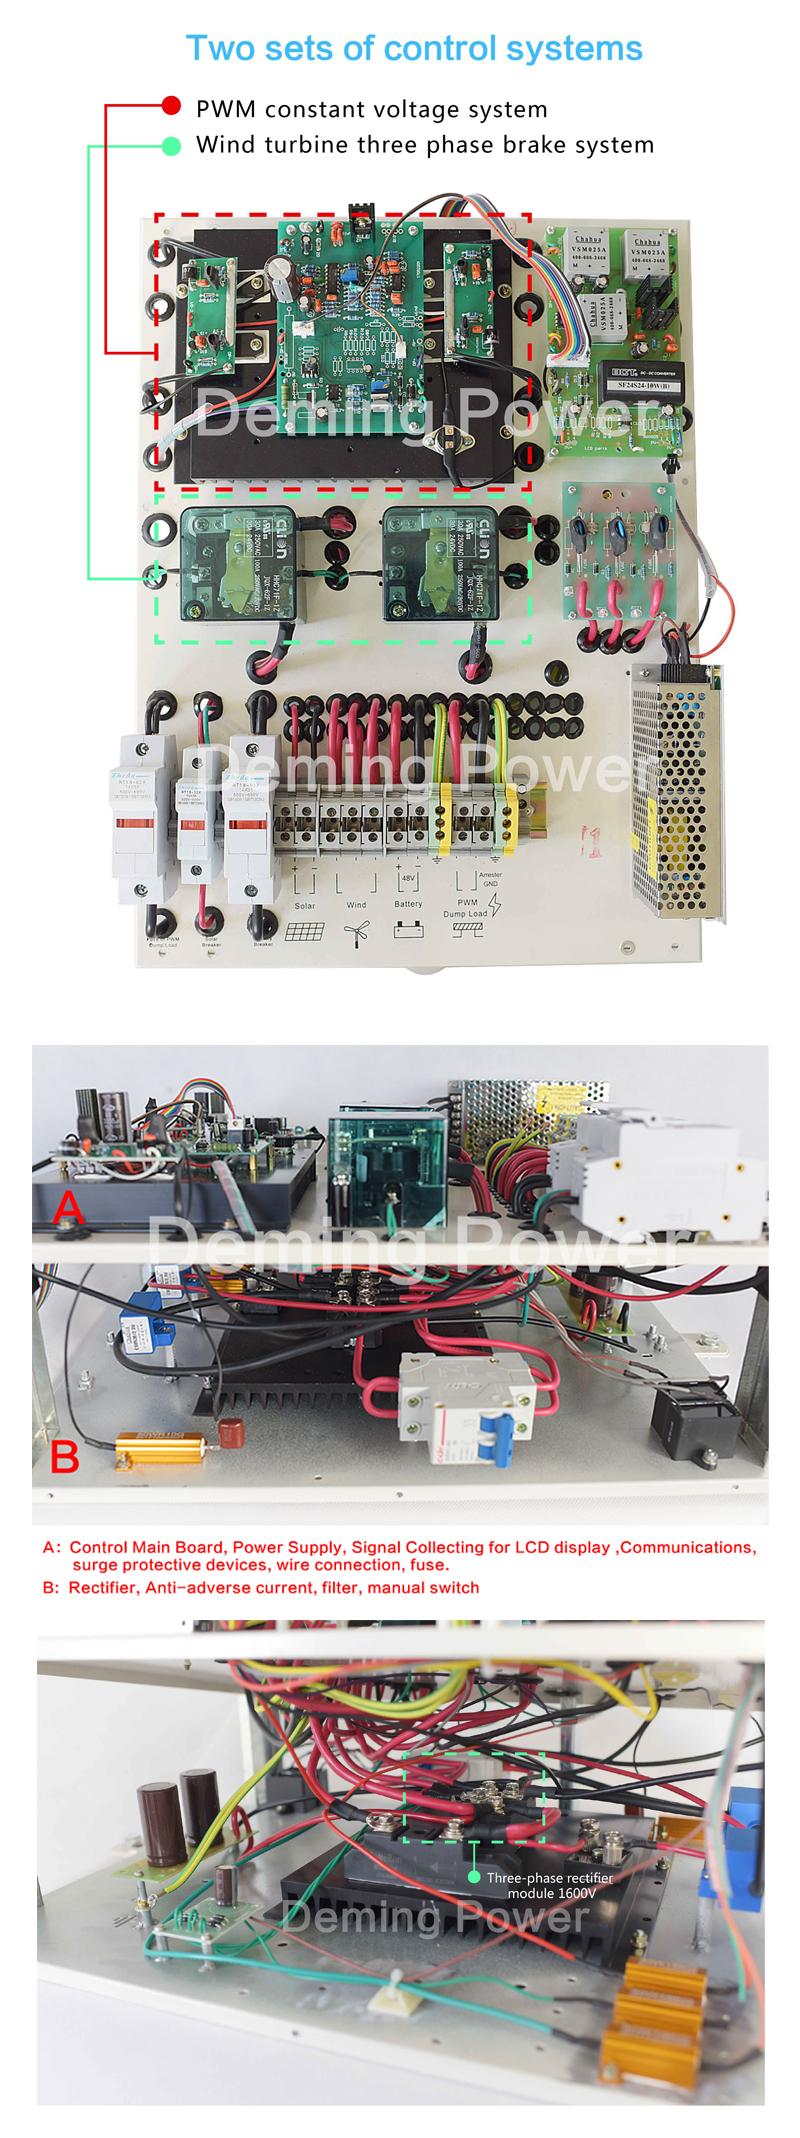 Wind Solar Hybrid Controller 10kw Diagram And Control Installation Schematic Fkj B Pwm Off Grid